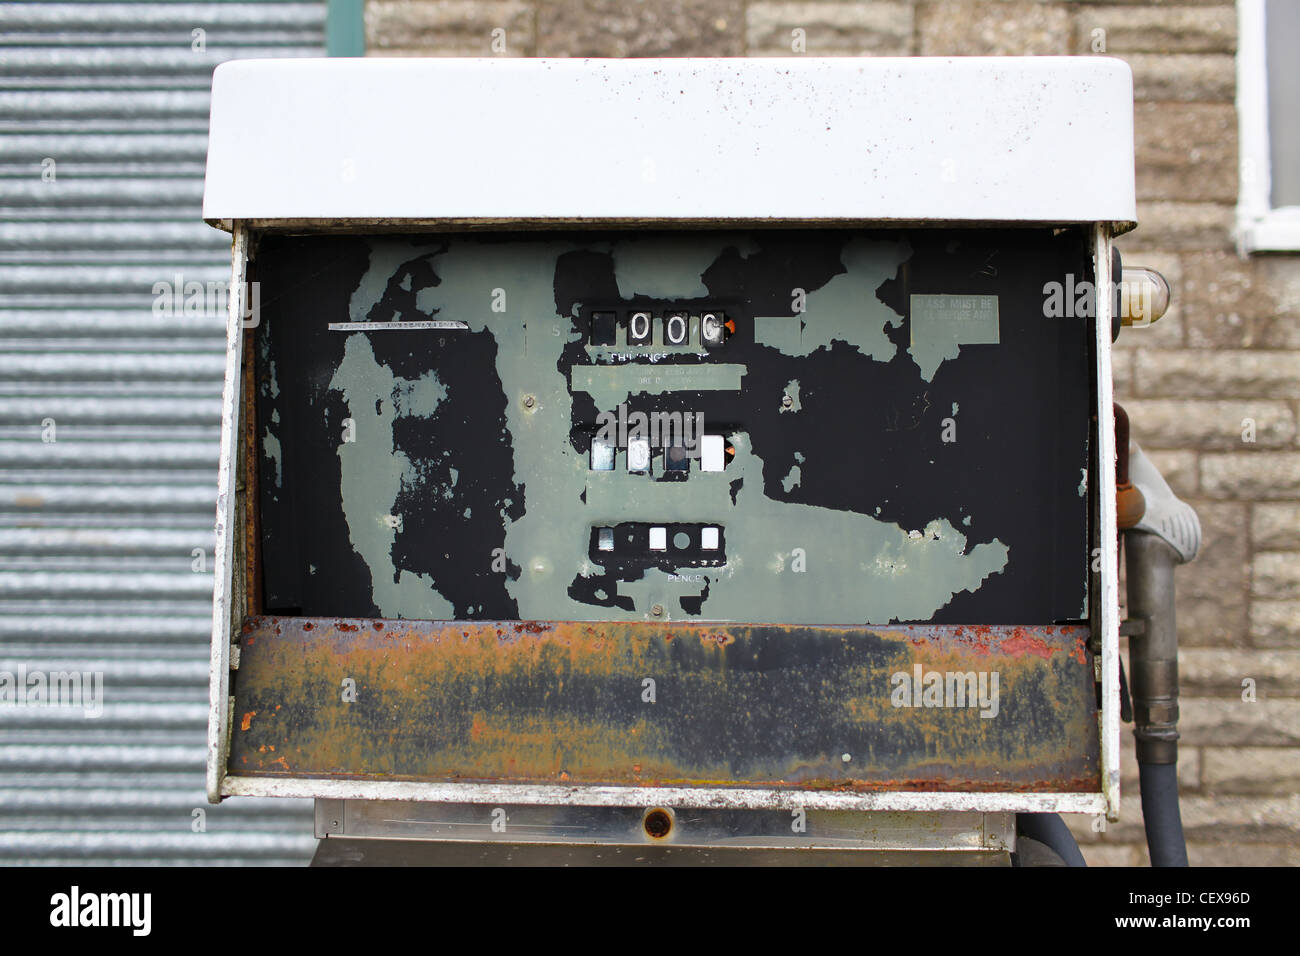 Antique unused broken petrol pump outside a garage door - Stock Image